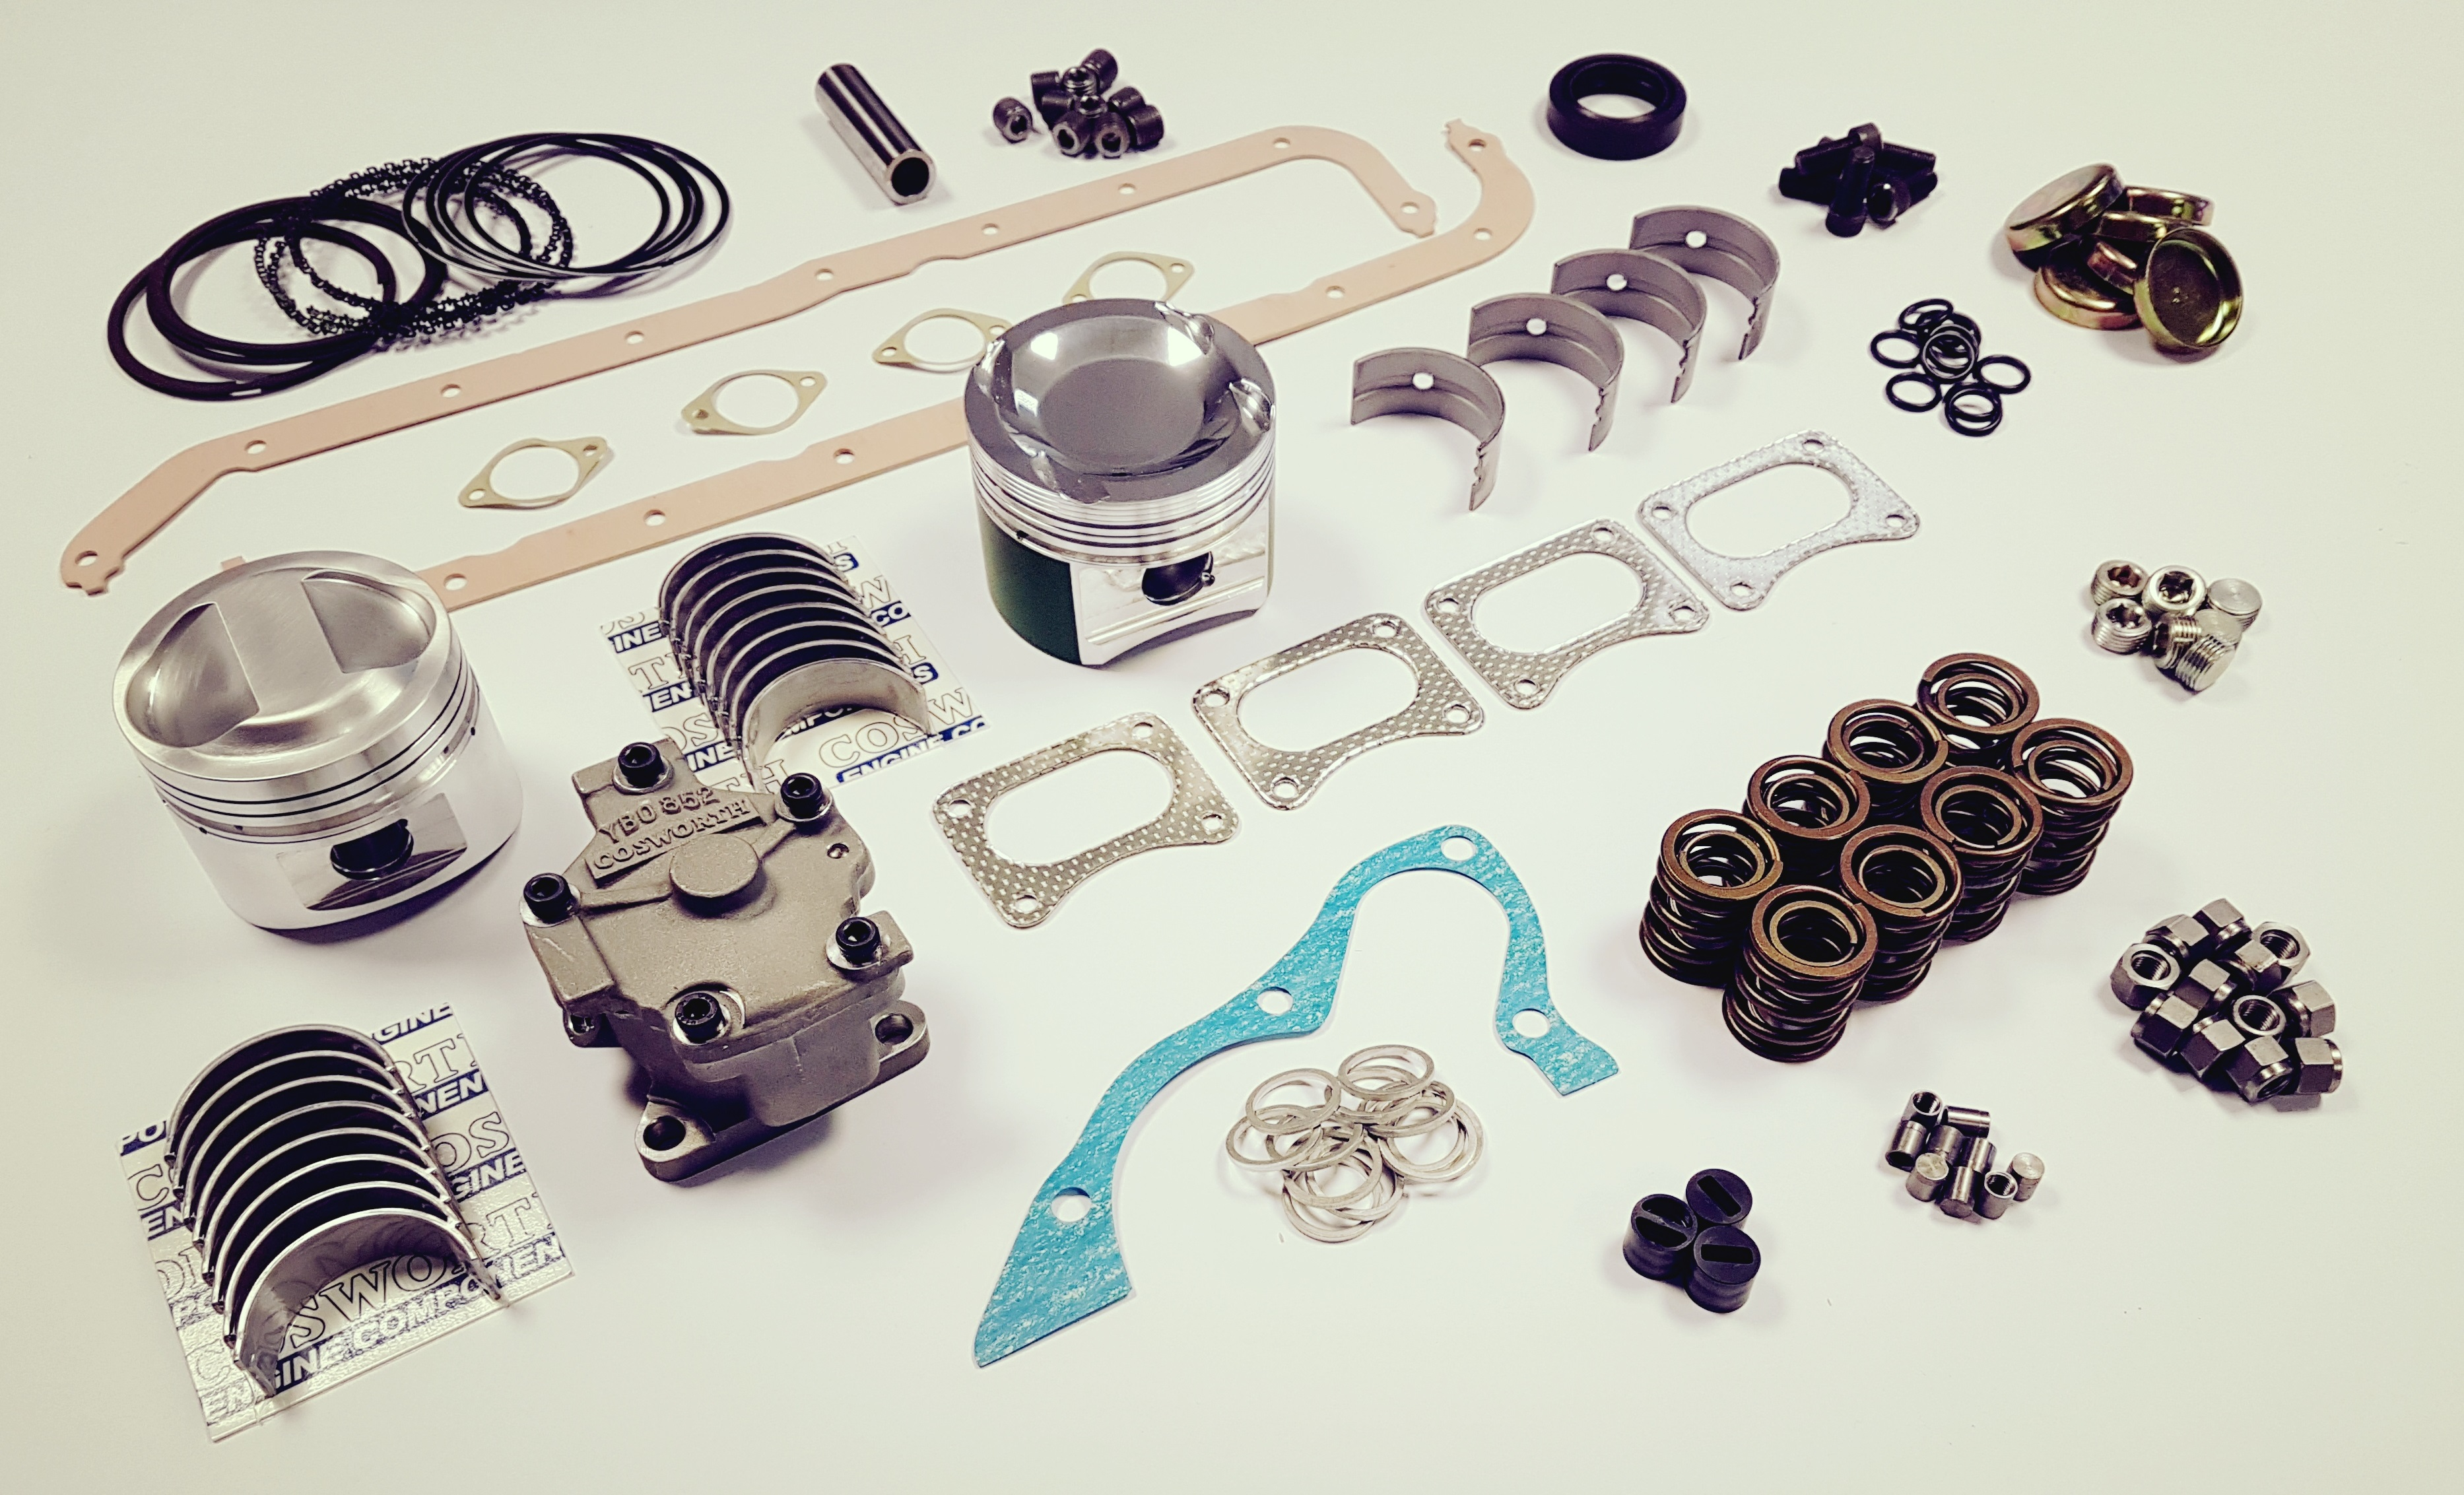 Cosworth Parts Montage